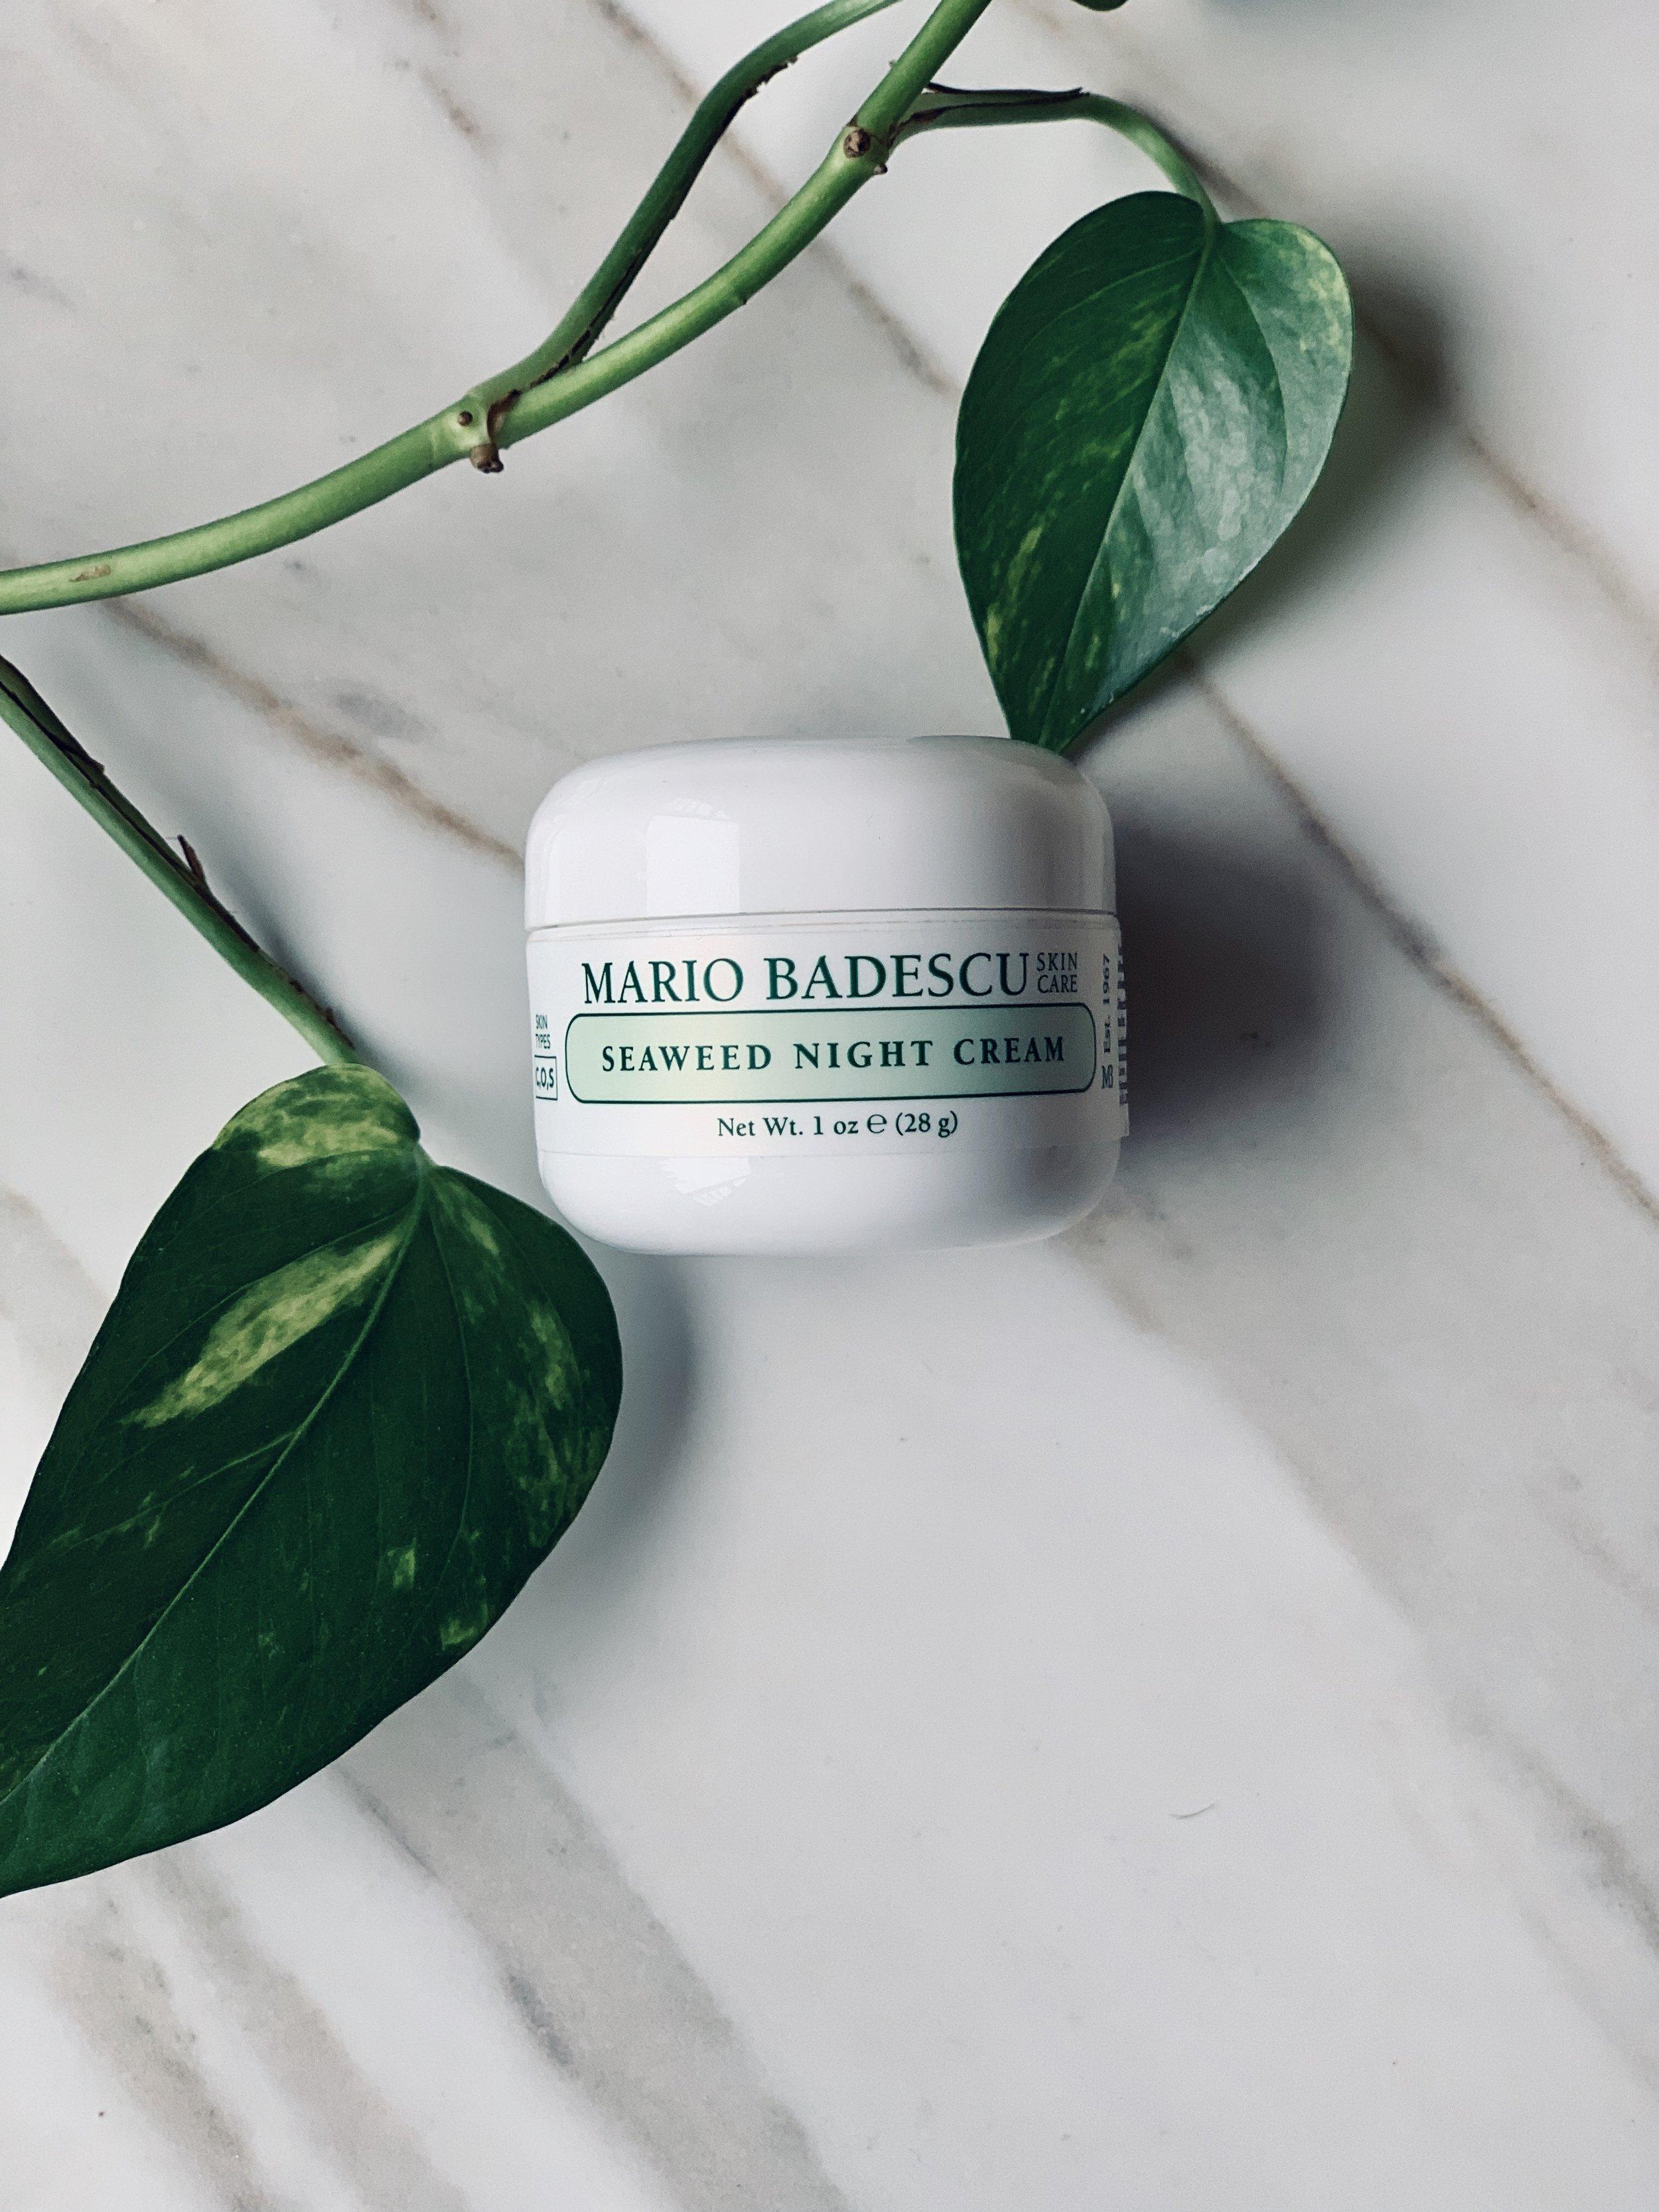 Mario Badescu - Seaweed Night Cream